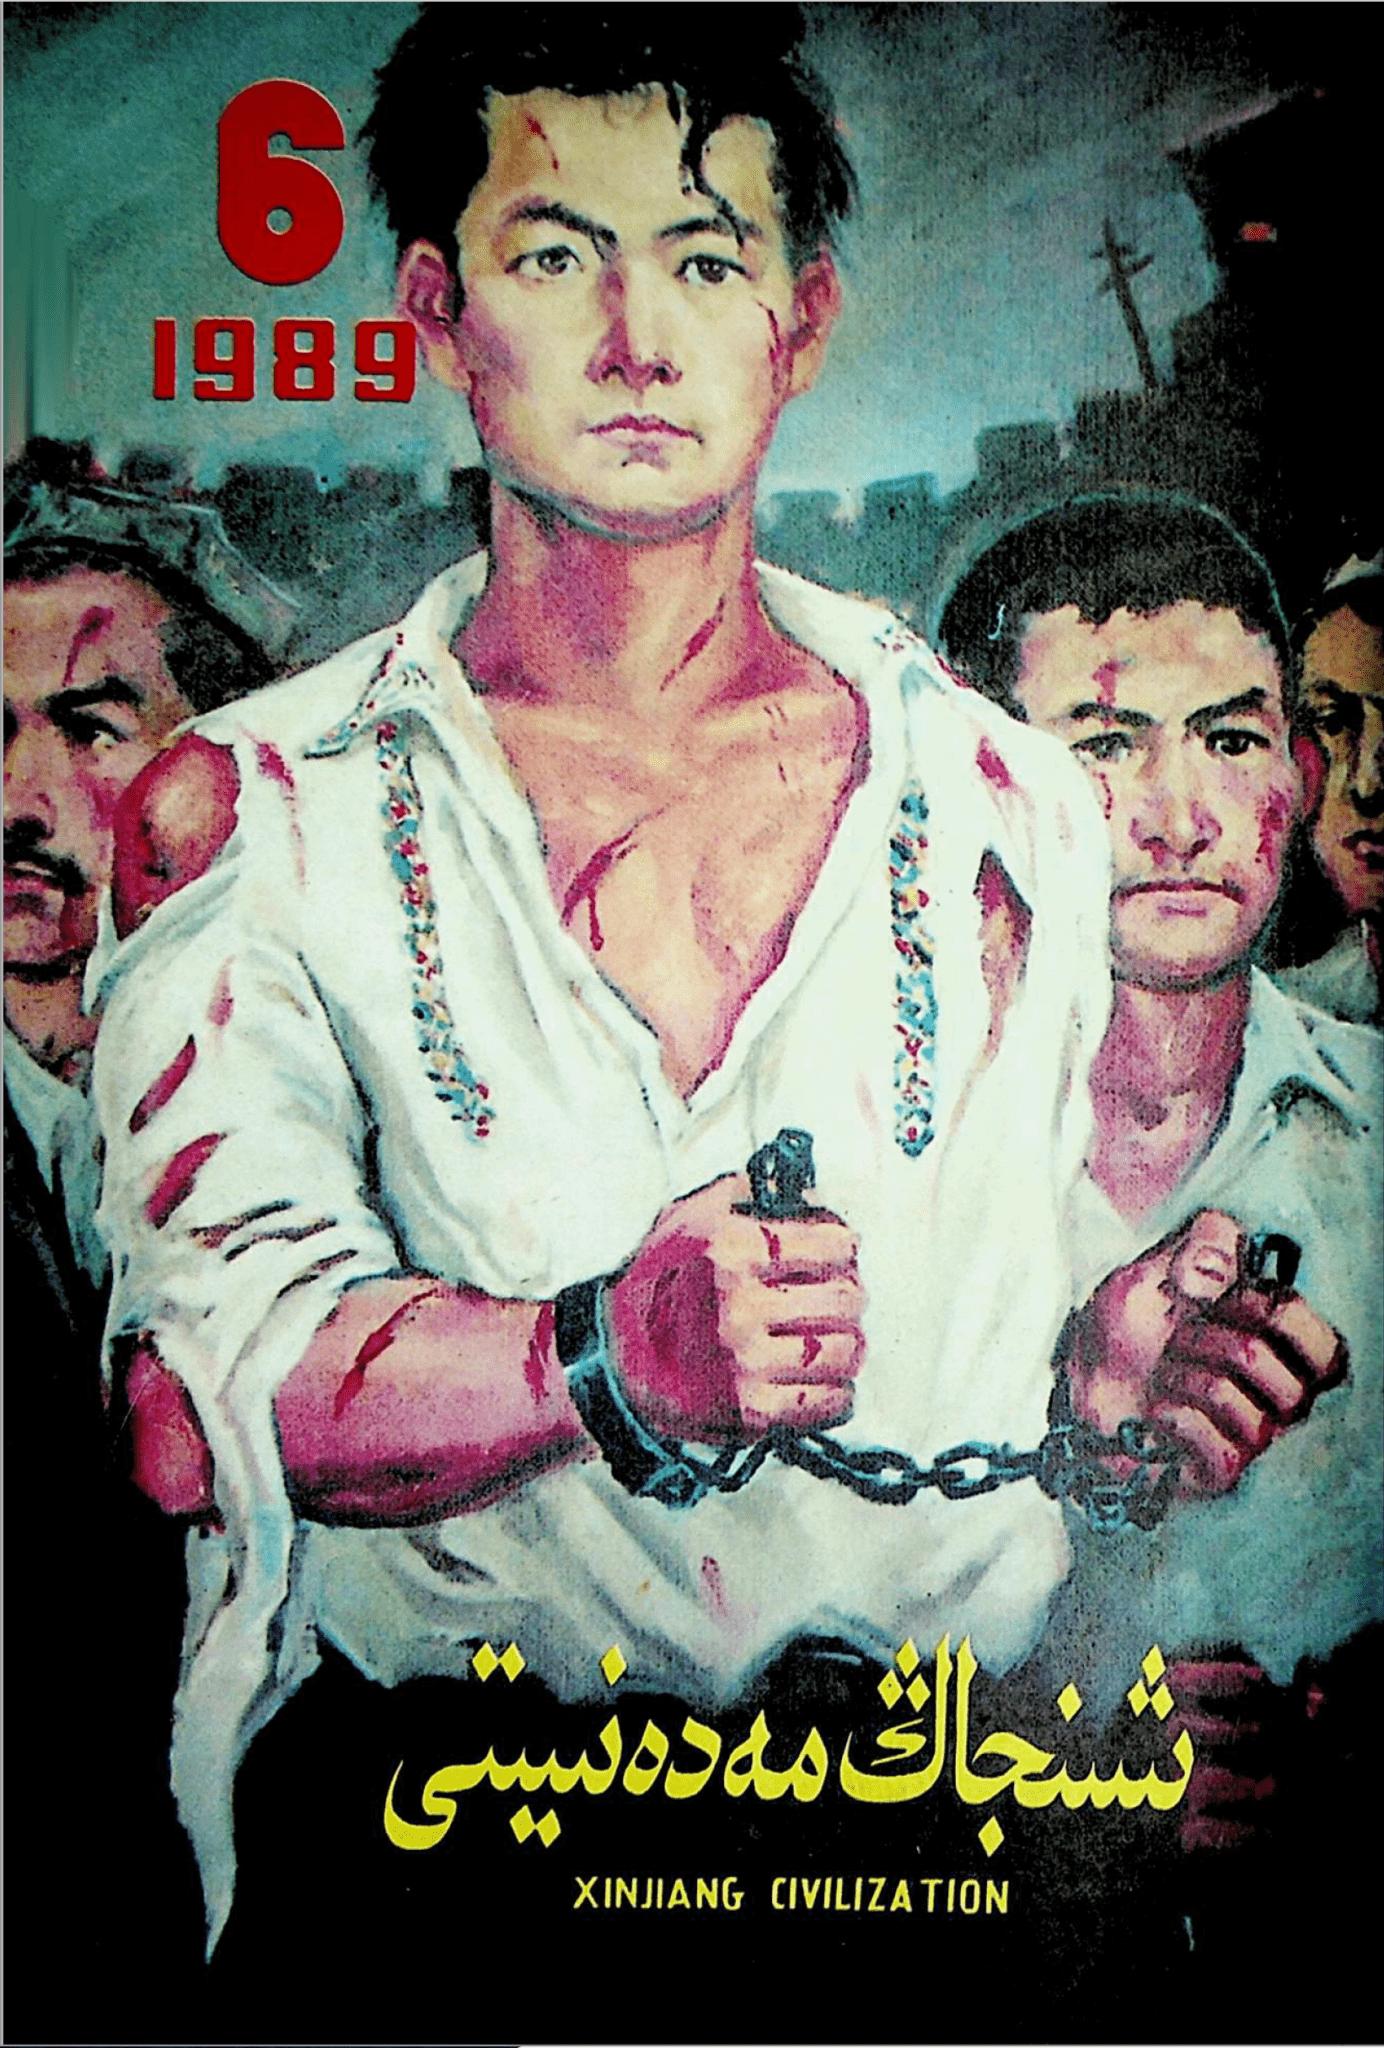 Screenshot 2020 03 05 at 15.31.10 - شىنجاڭ مەدەنىيىتى 1989-يىلى 6-سان